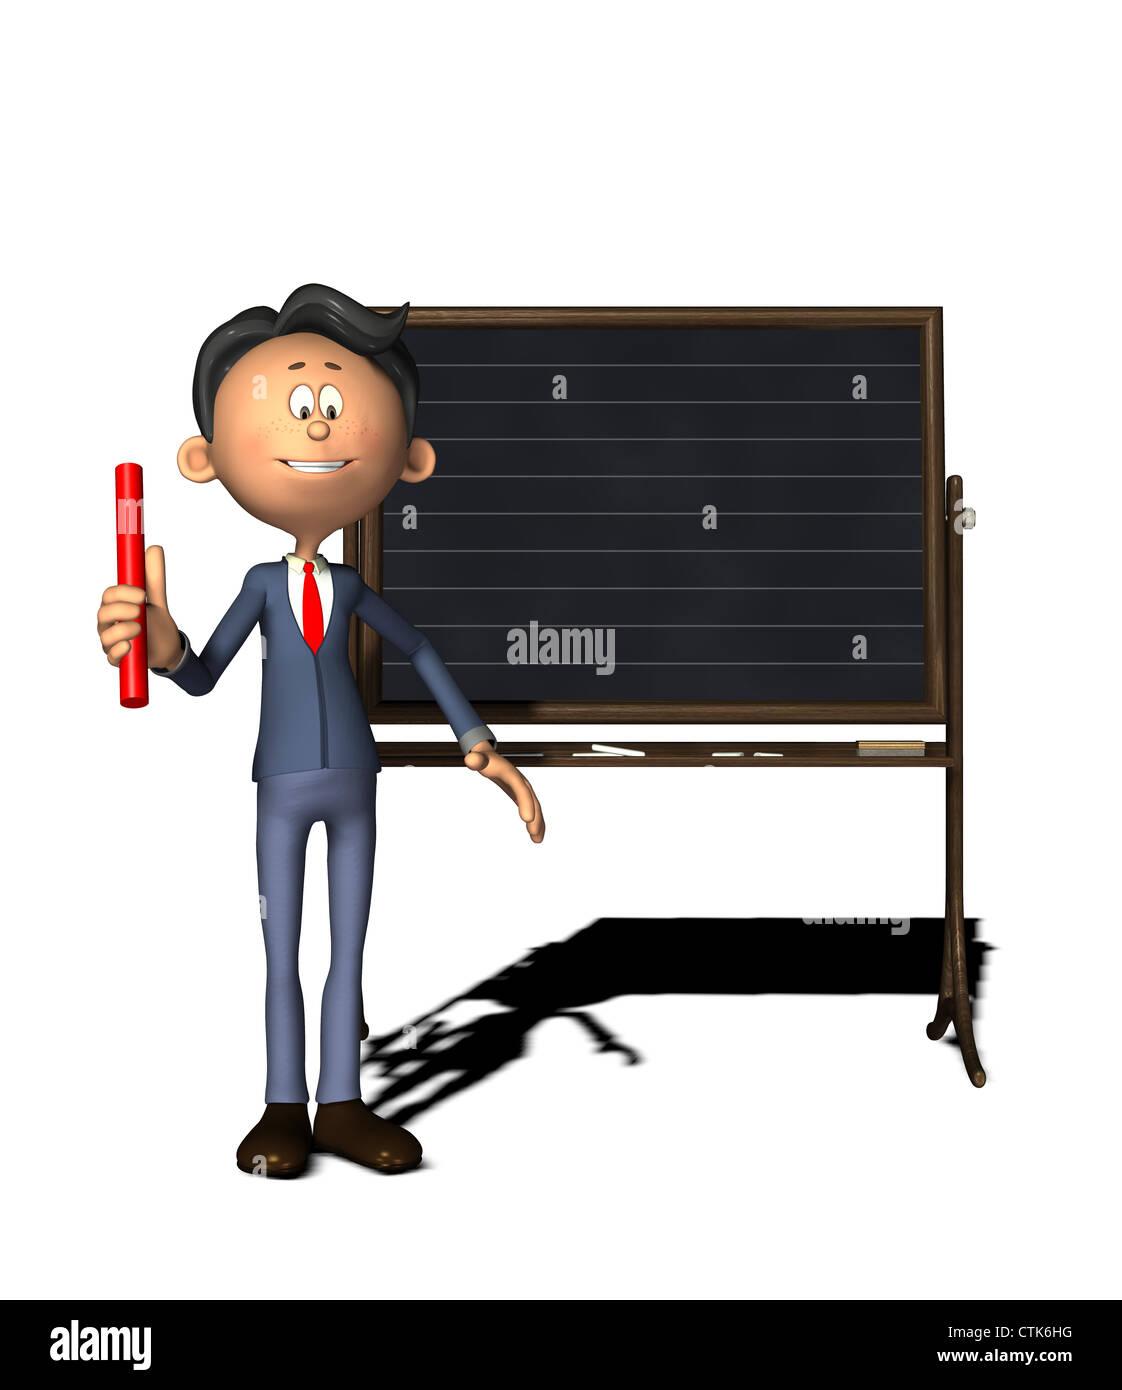 Cartoon Figur Physiklehrer zeigt die rechten Daumen-Regel Stockfoto